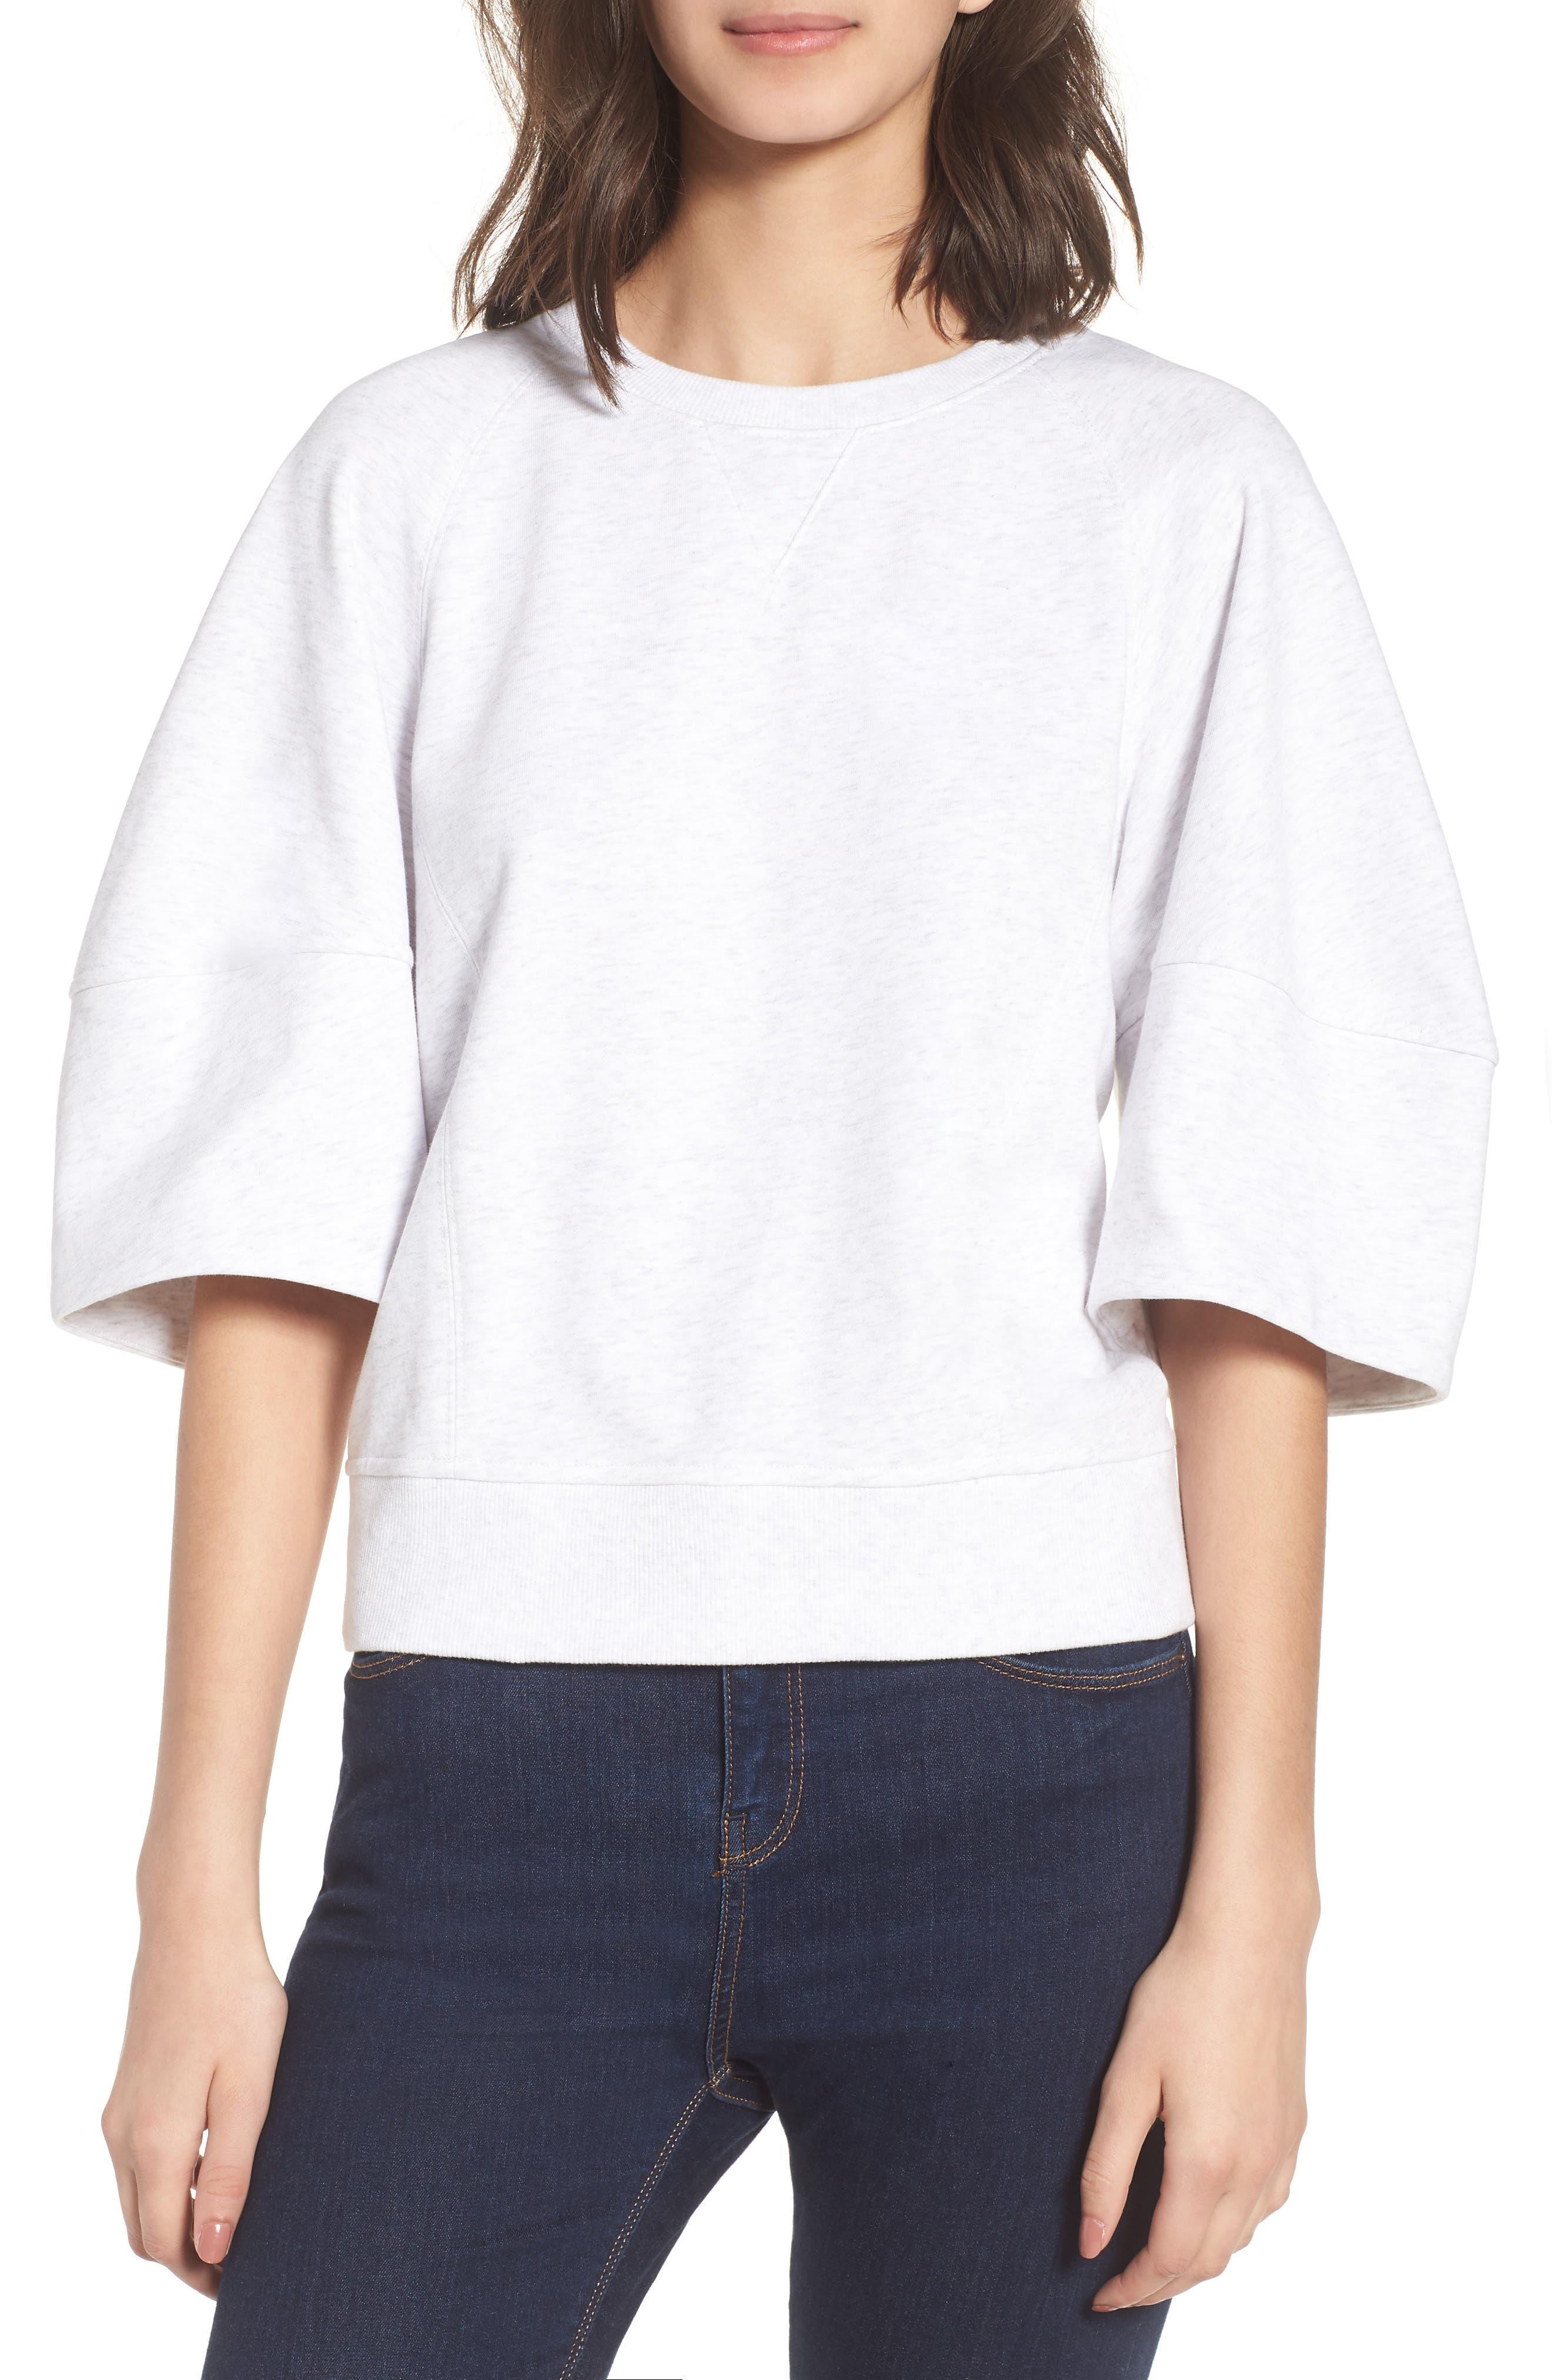 Main Image - Currently in Love Puff Sleeve Sweatshirt